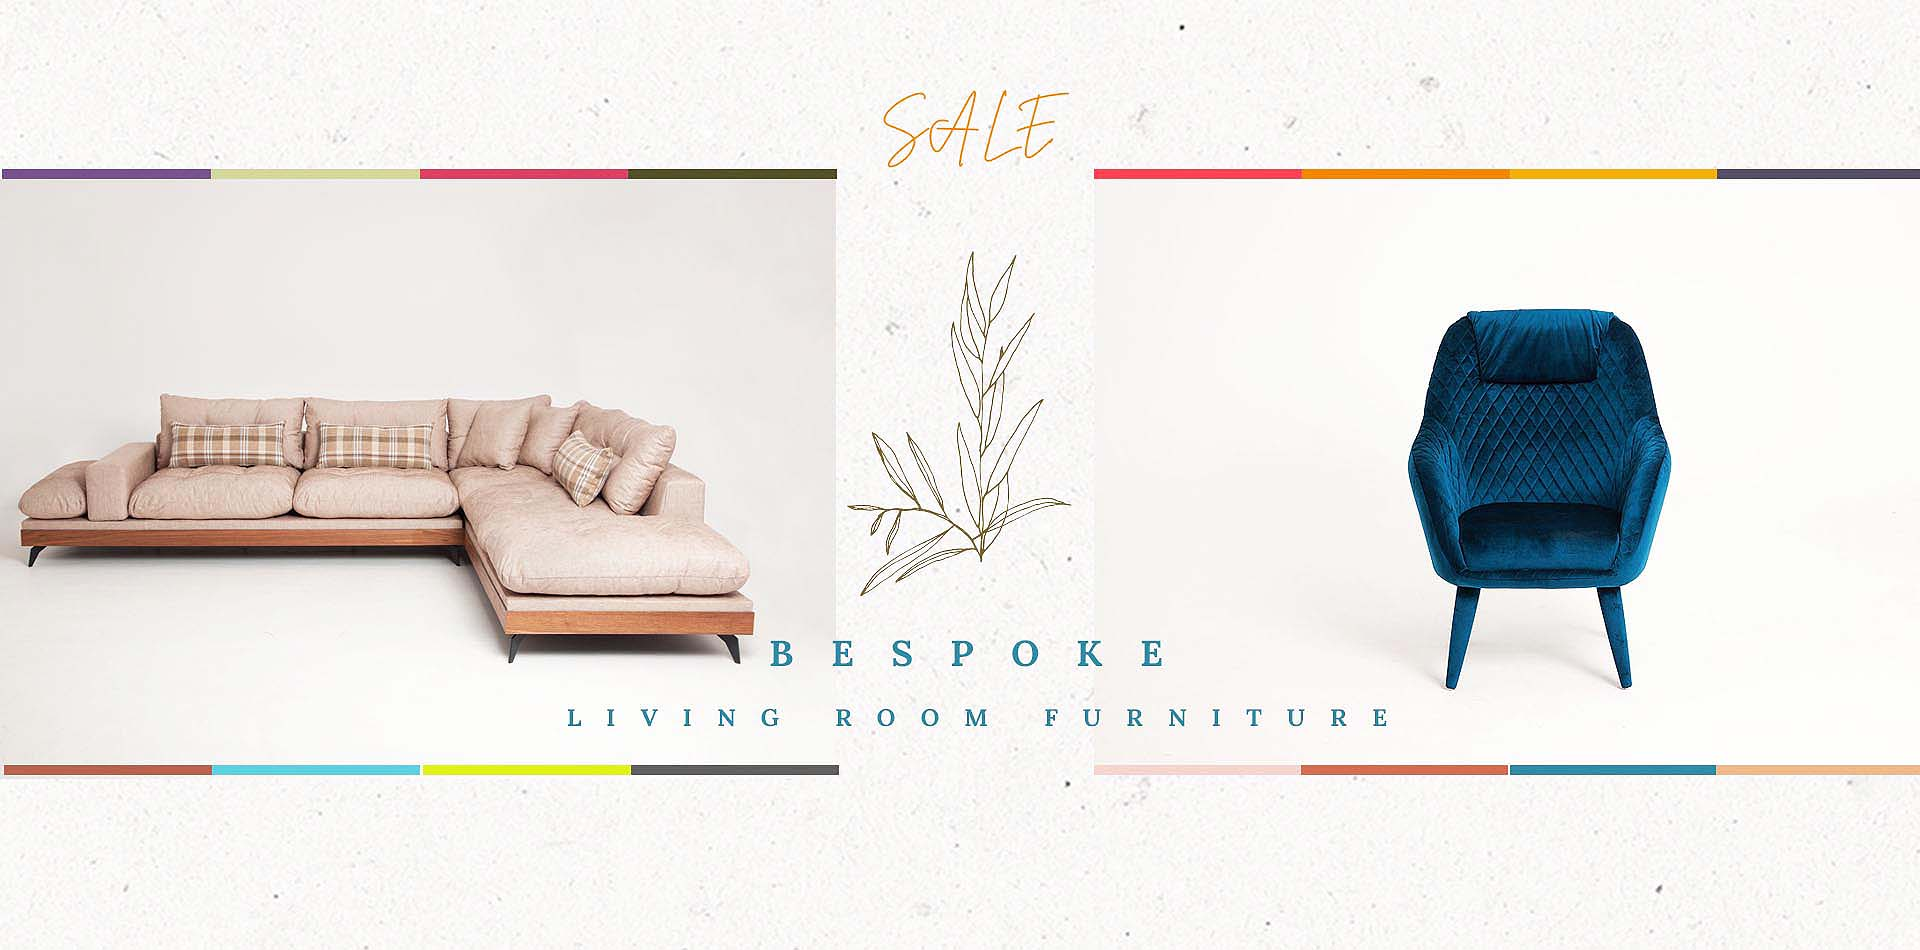 Bespoke_luxury_living_room_furniture_Urvission_Interiors